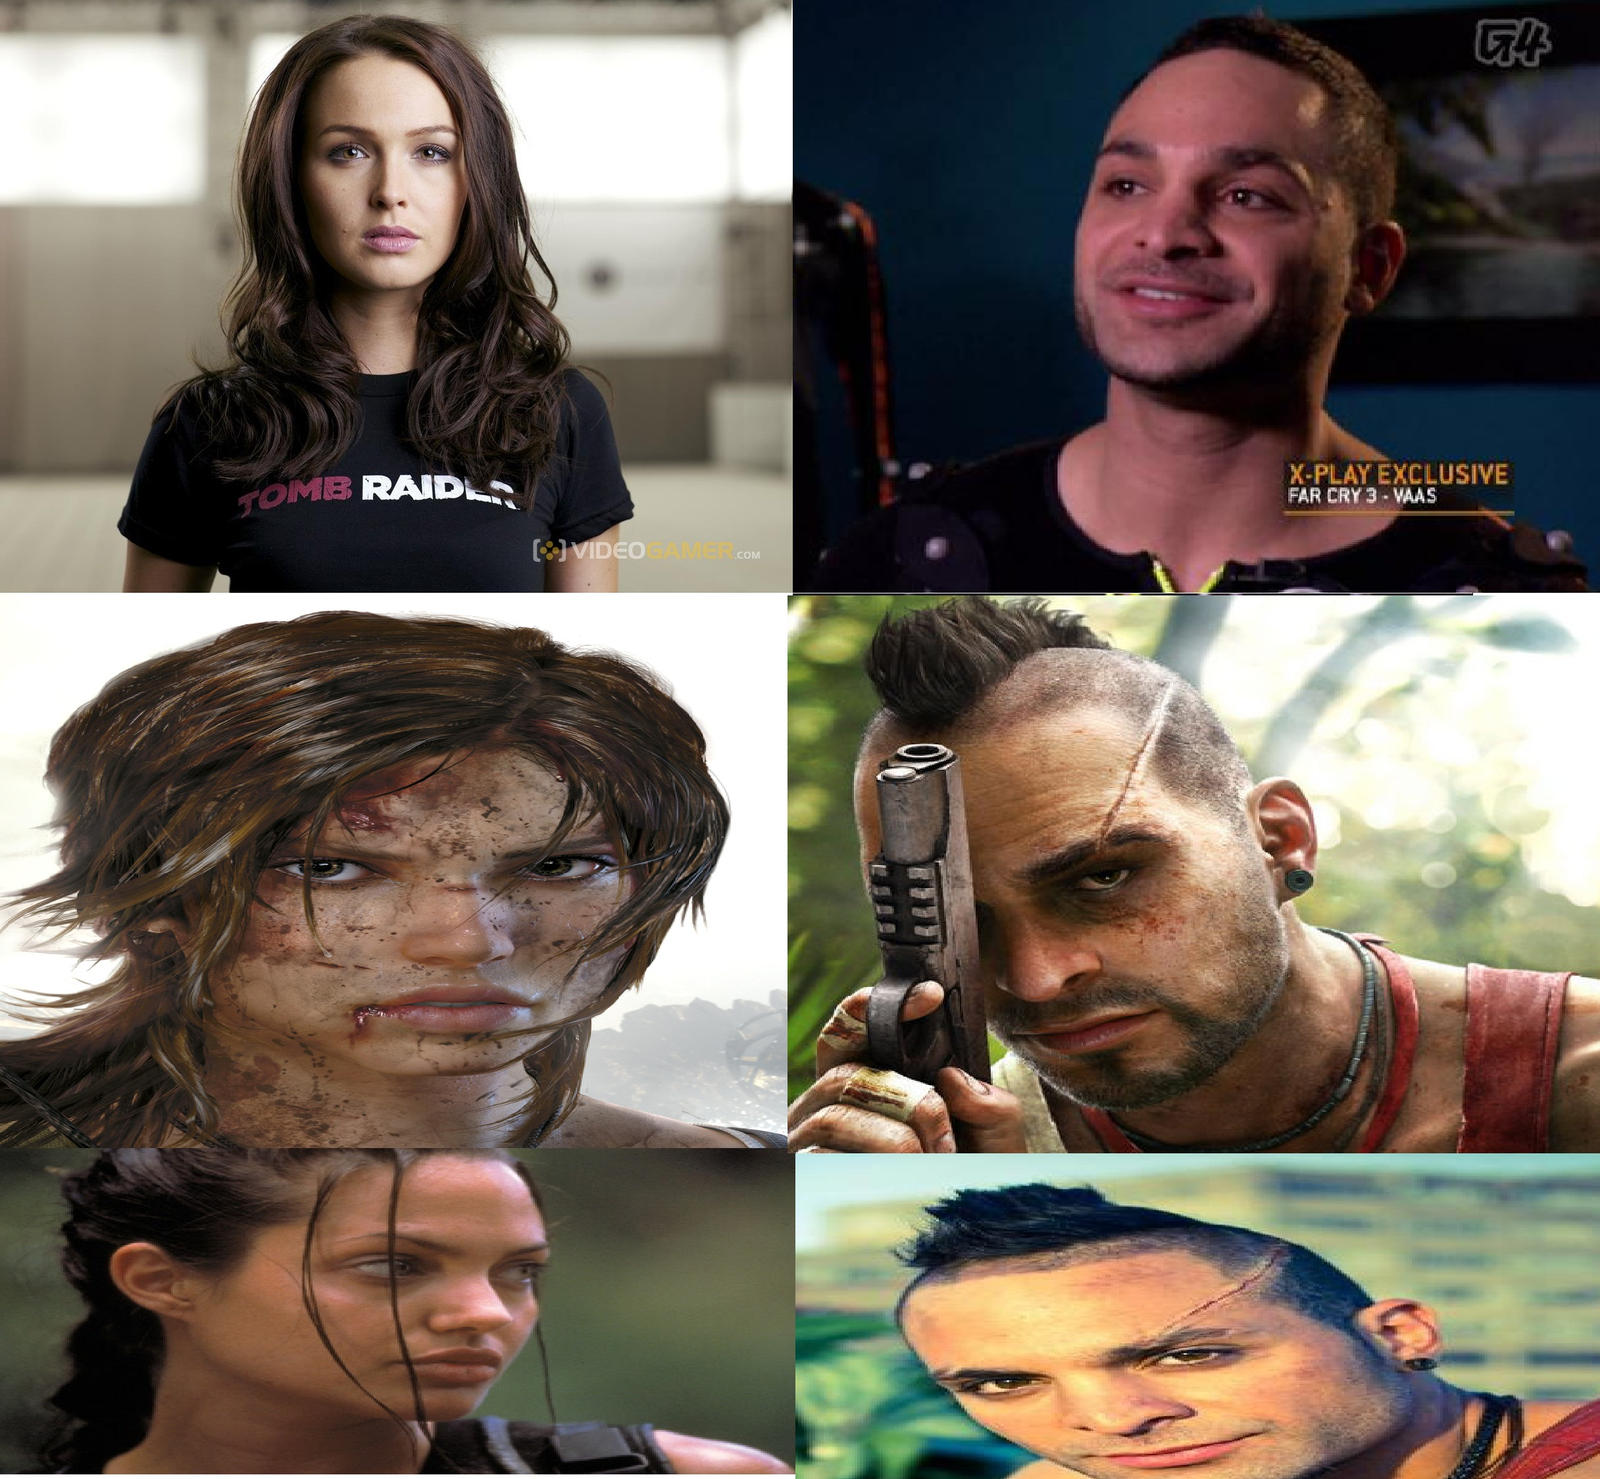 Far Cry 3 Citra Actress Lara Croft Actr...